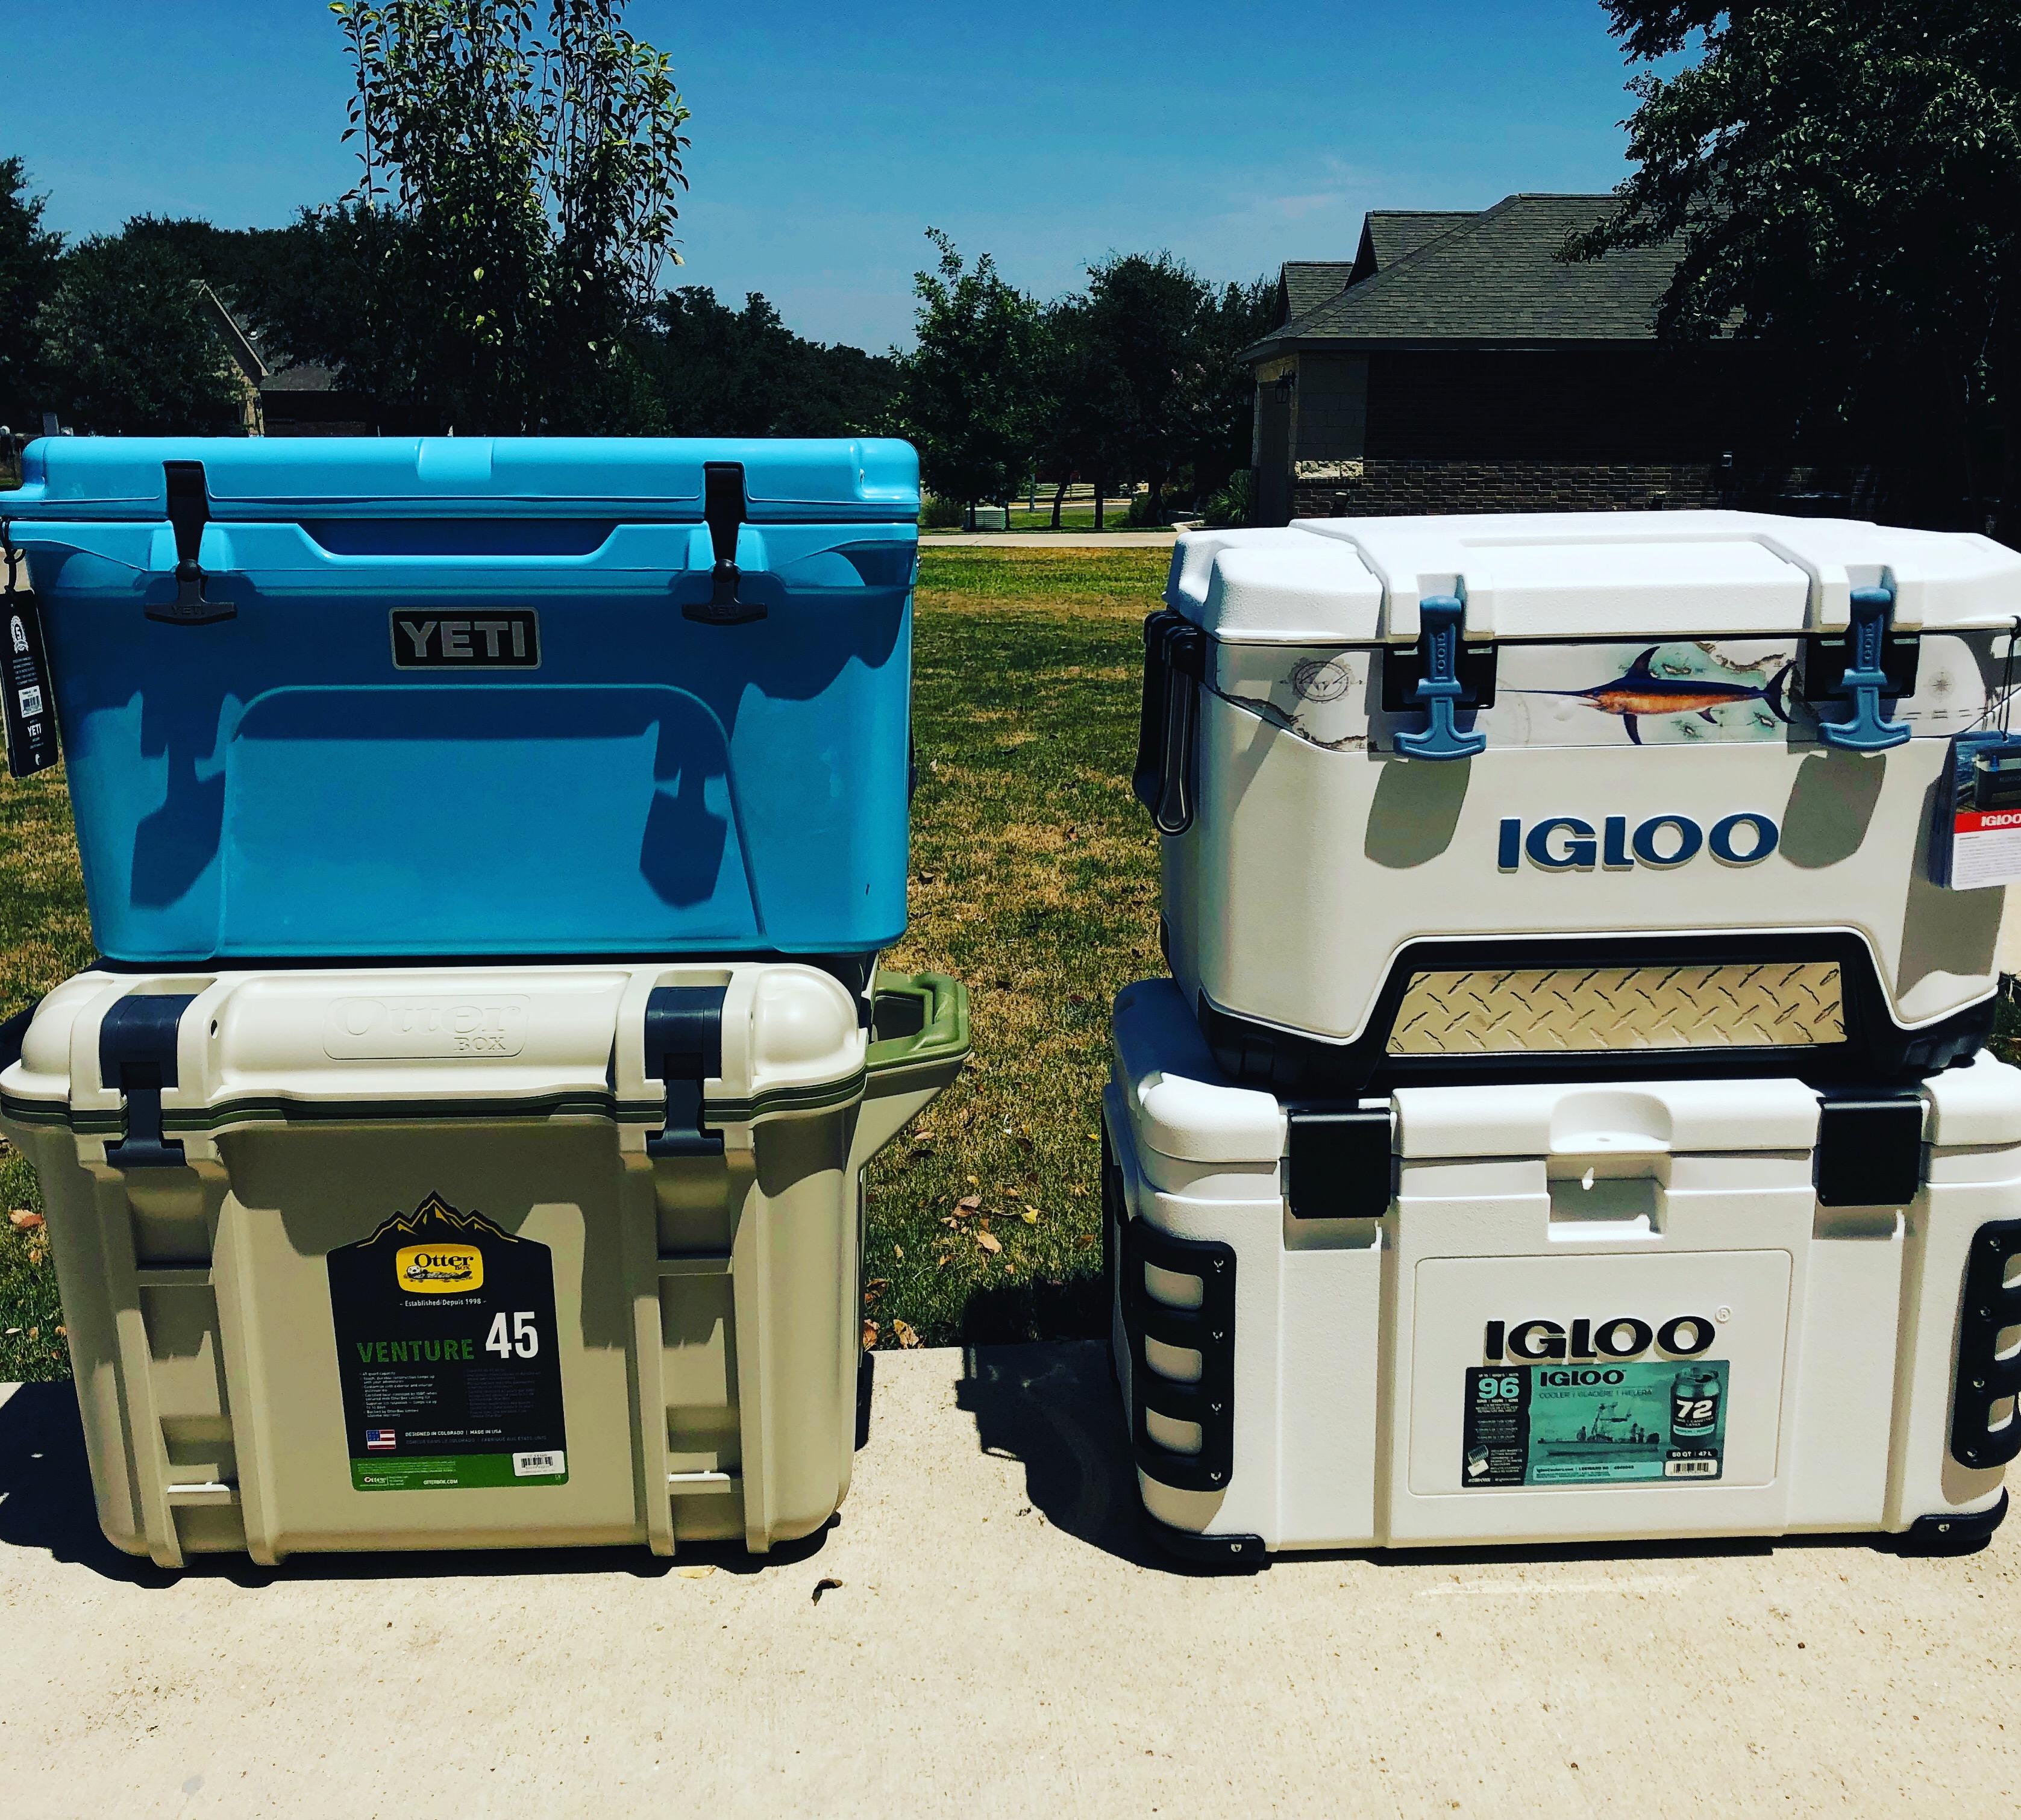 Cooler Ice Retention Test YETI Otter Box Igloo Payne Outdoors